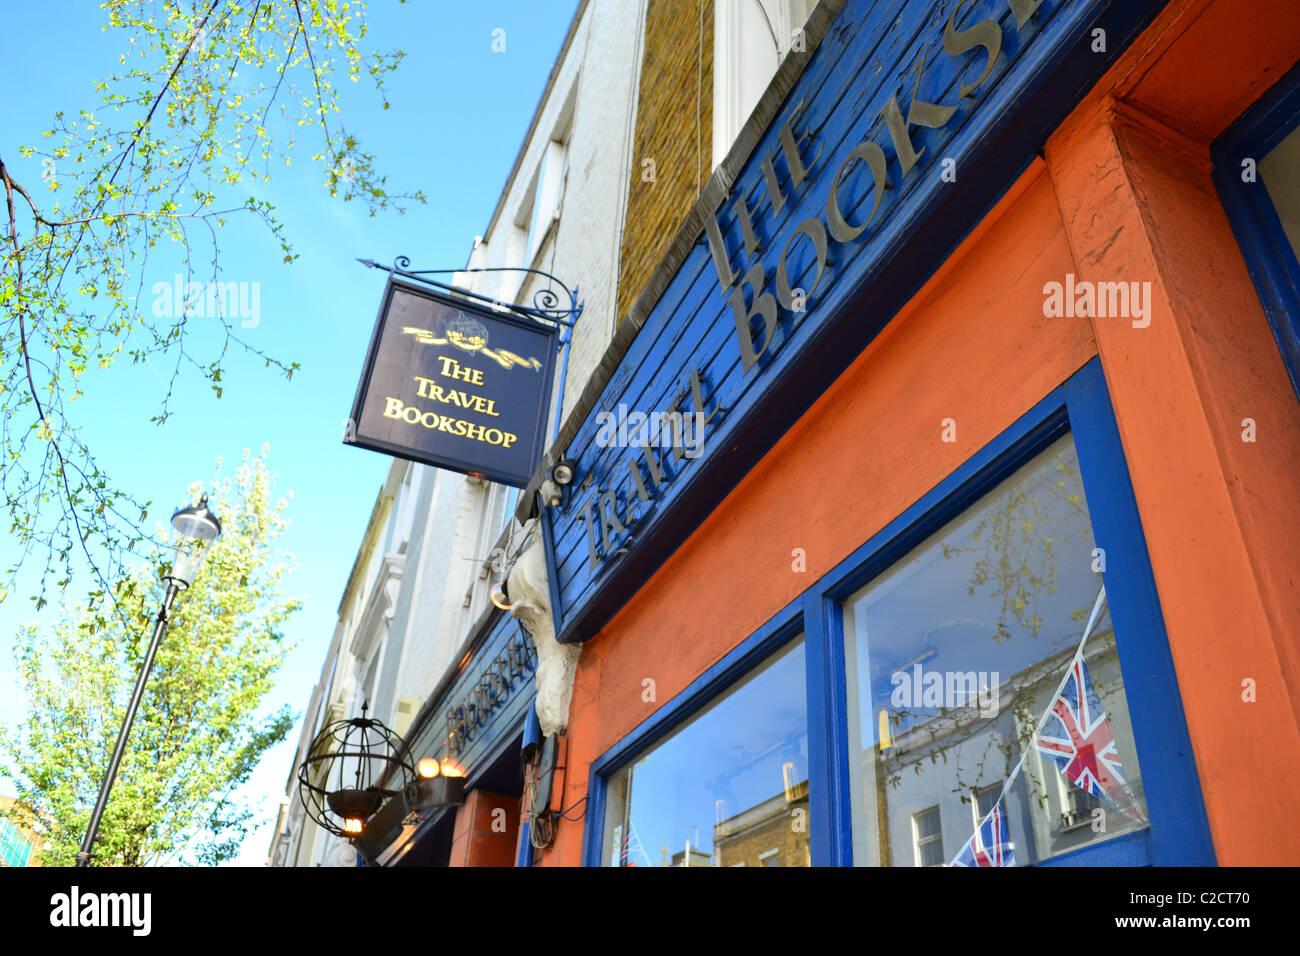 'The Travel Bookshop' that inspired the 2000 film. Near Portobello Road, Notting Hill, London, UK ARTIFEX - Stock Image